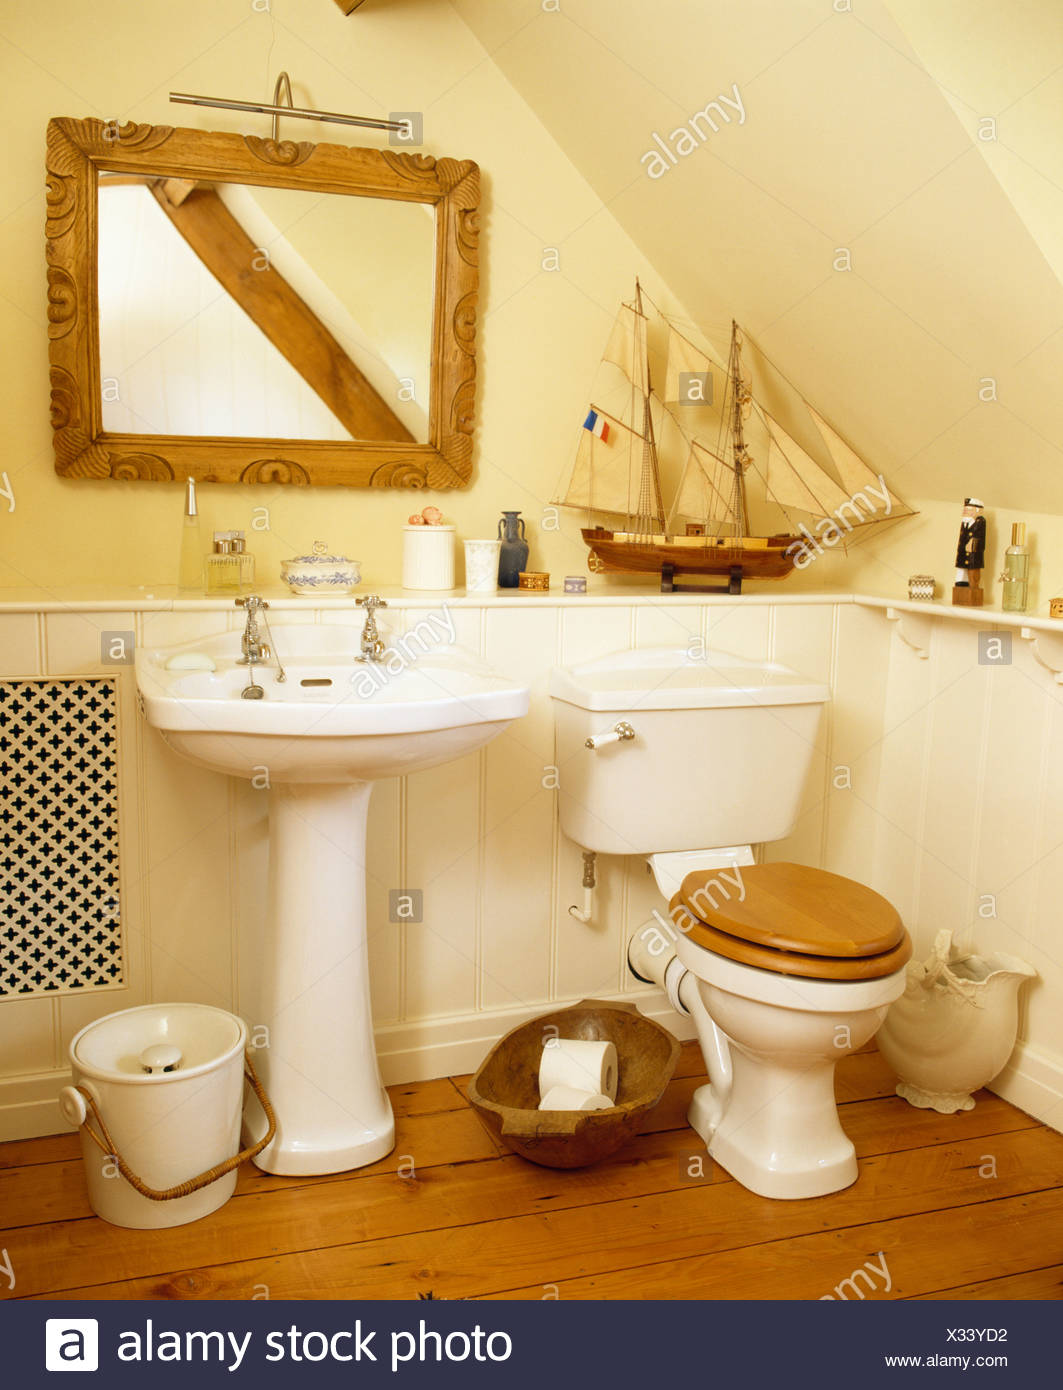 Wooden Framed Mirror Above White Pedestal Basin In Cottage Bathroom With  Model Sailing Boat On Shelf Above Toilet